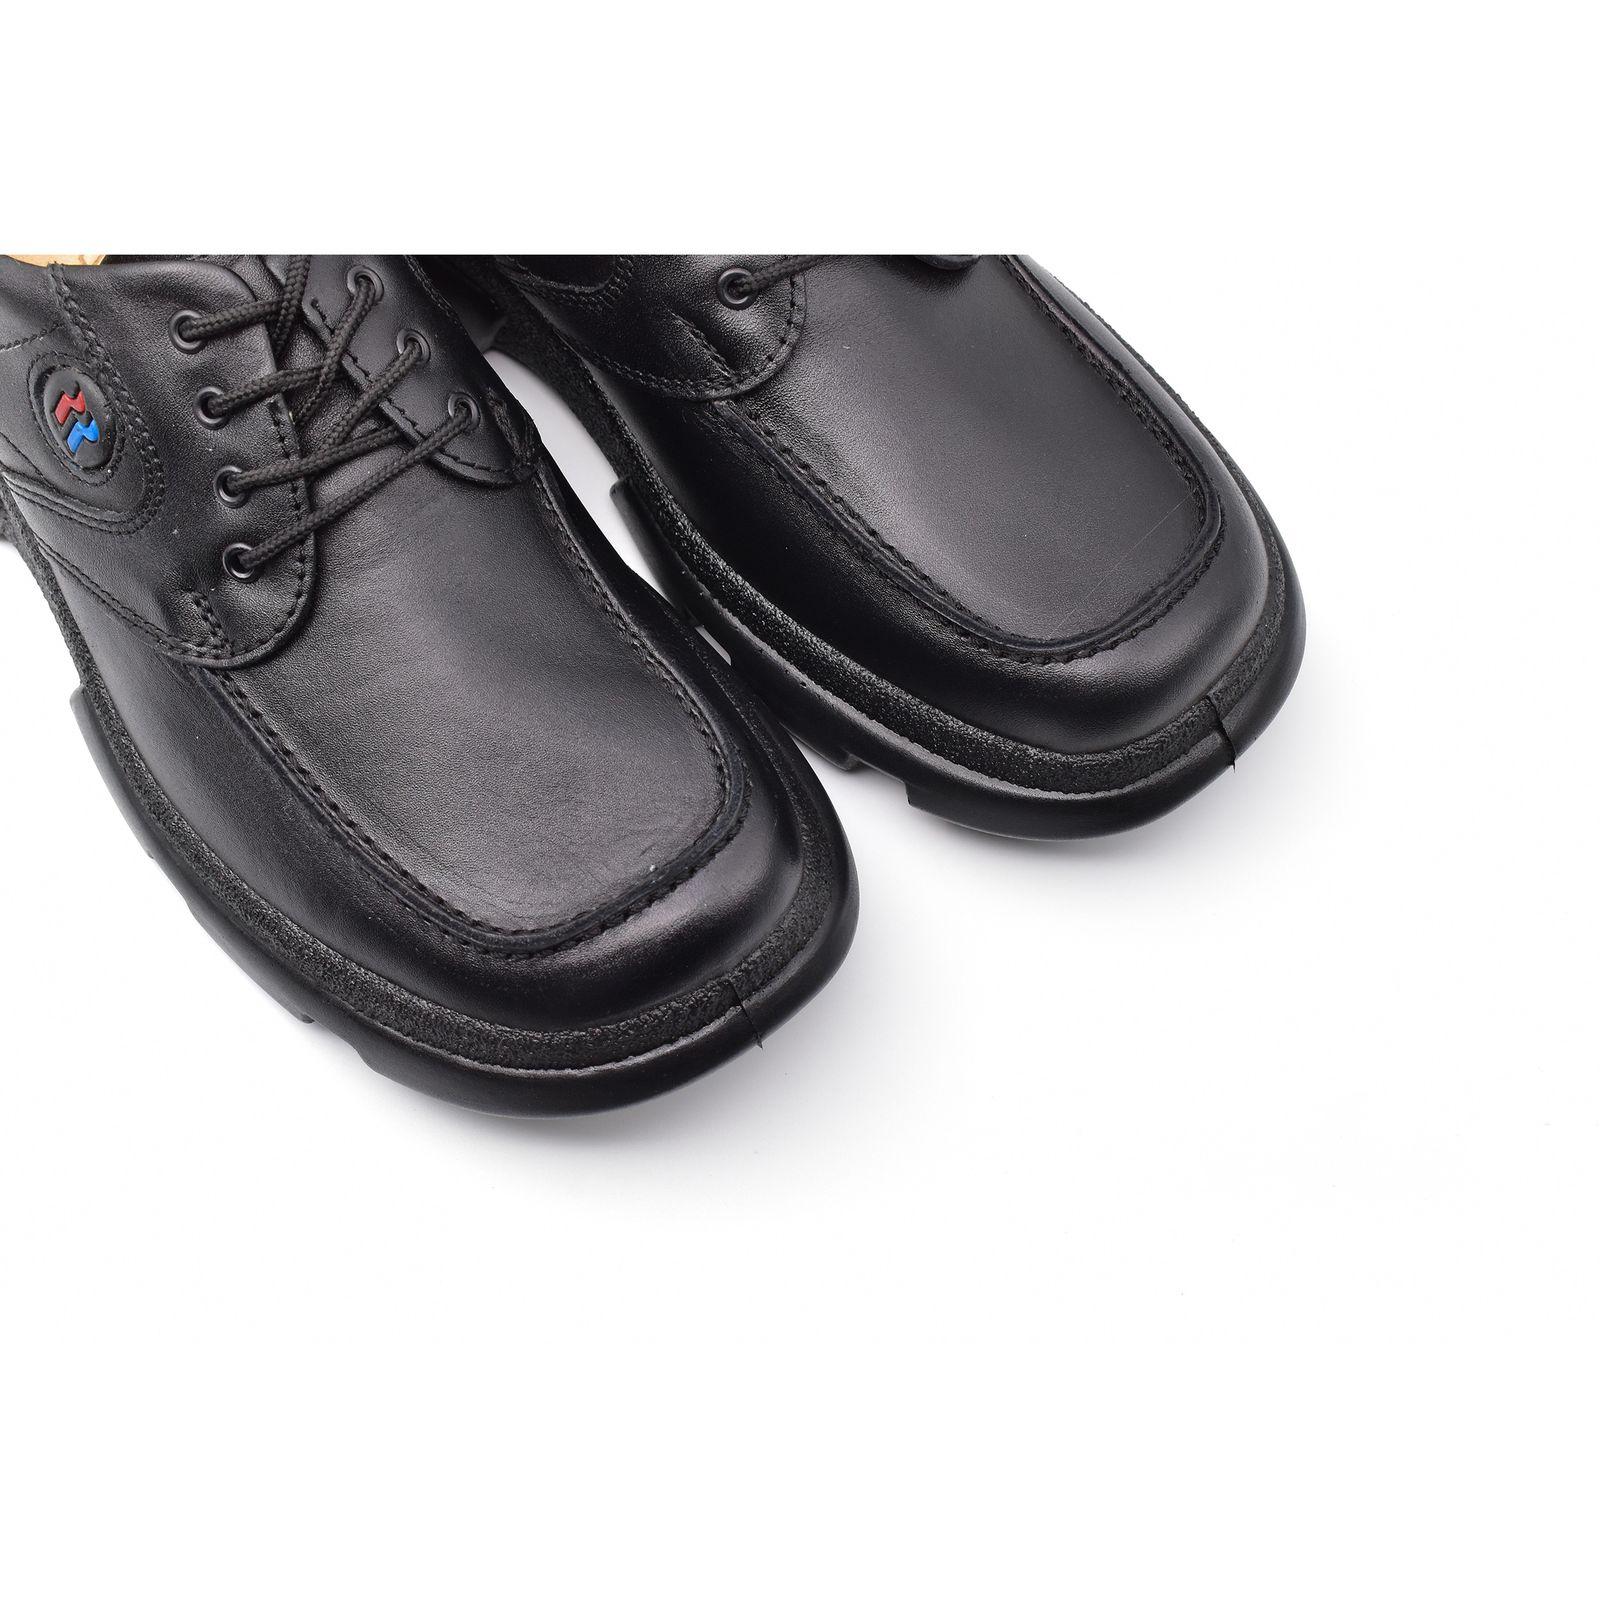 کفش روزمره مردانه البرز مدل تورنتو کد 7009 -  - 3